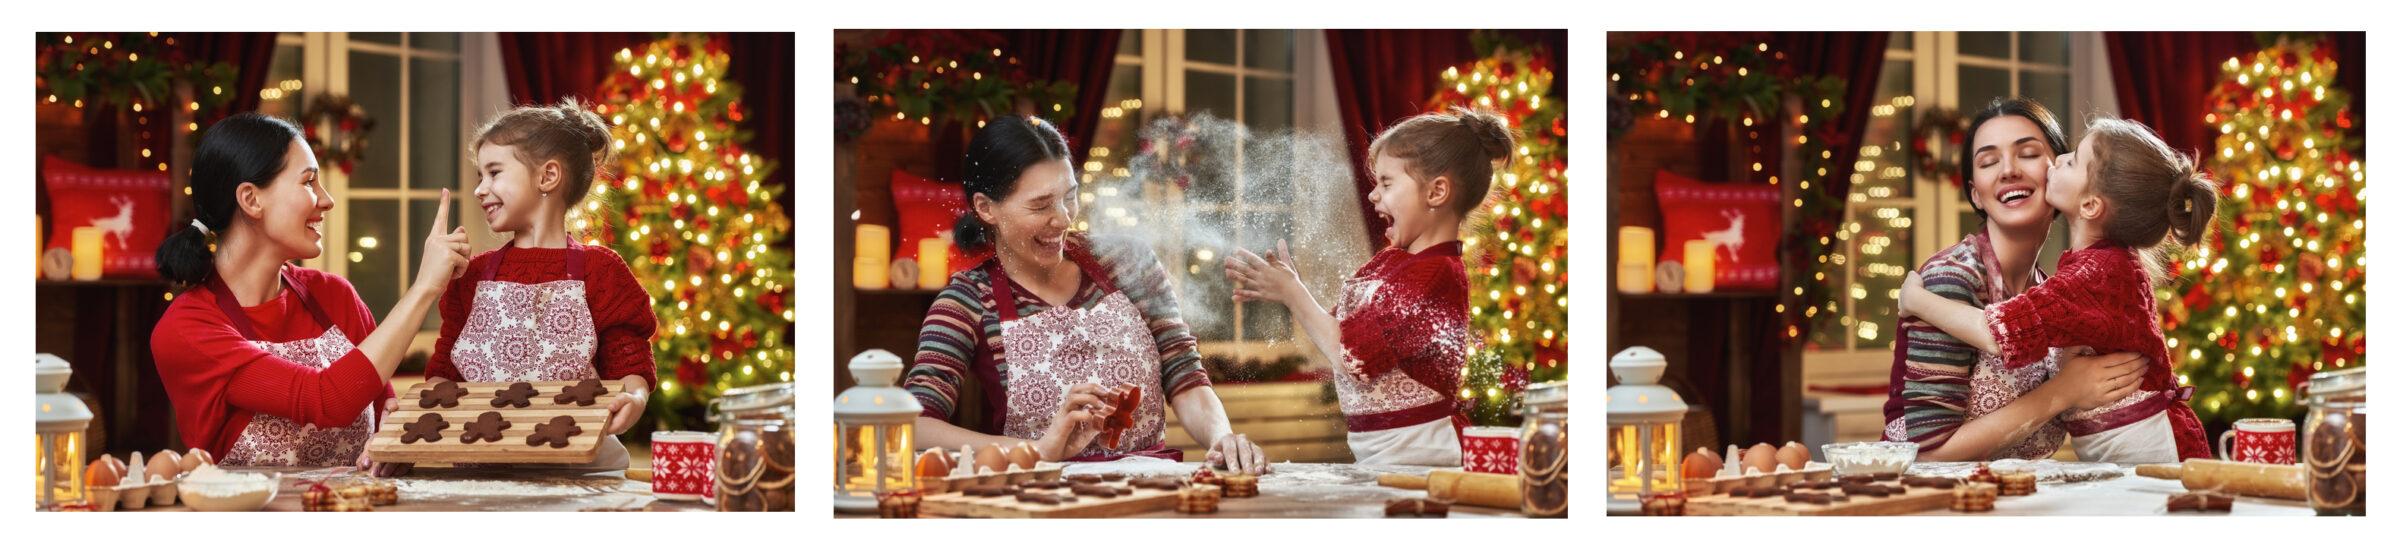 family mum daughter fire home fun christmas